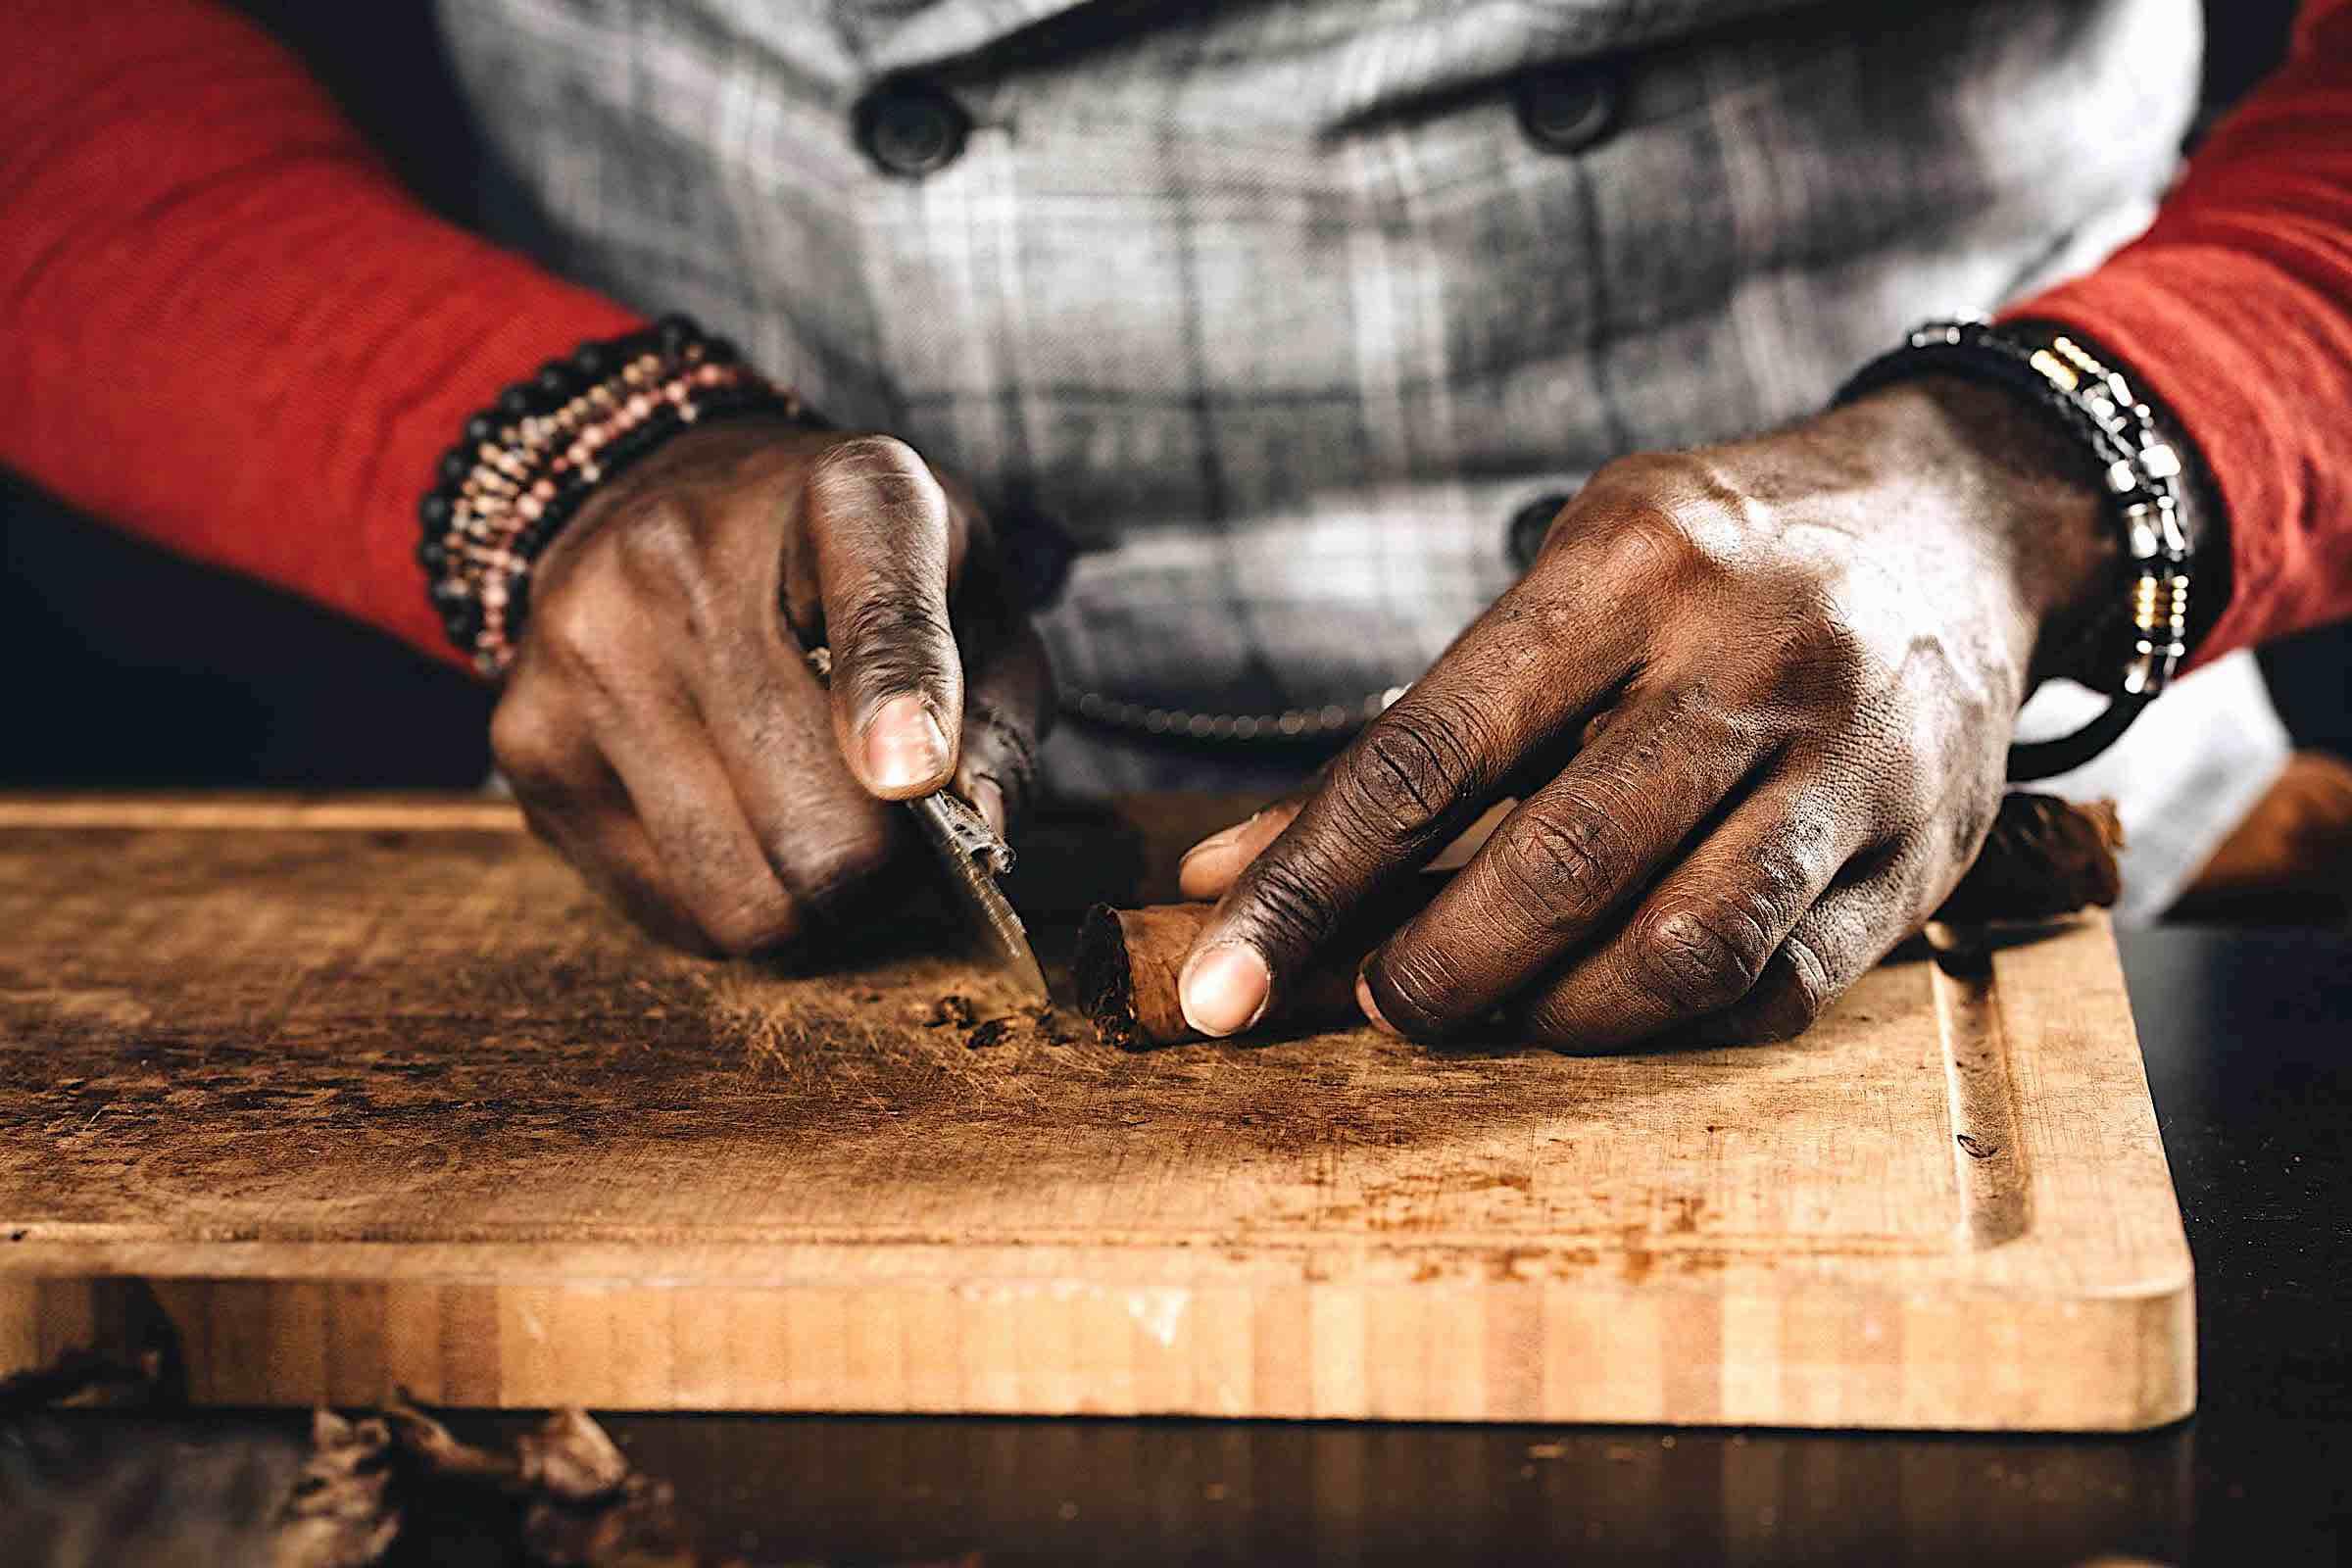 Zigarrendreher | Hamburg | Zigarrenroller | Zigarrenrollerin | Anfragen | Mieten | Buchen | Trocadero | Handgemacht | Zigarren | Robusto | Corona | Torpedo | Churchill | Banderole | Bauchbinde | drehen | Tabak | Firmenvents | Hochzeit